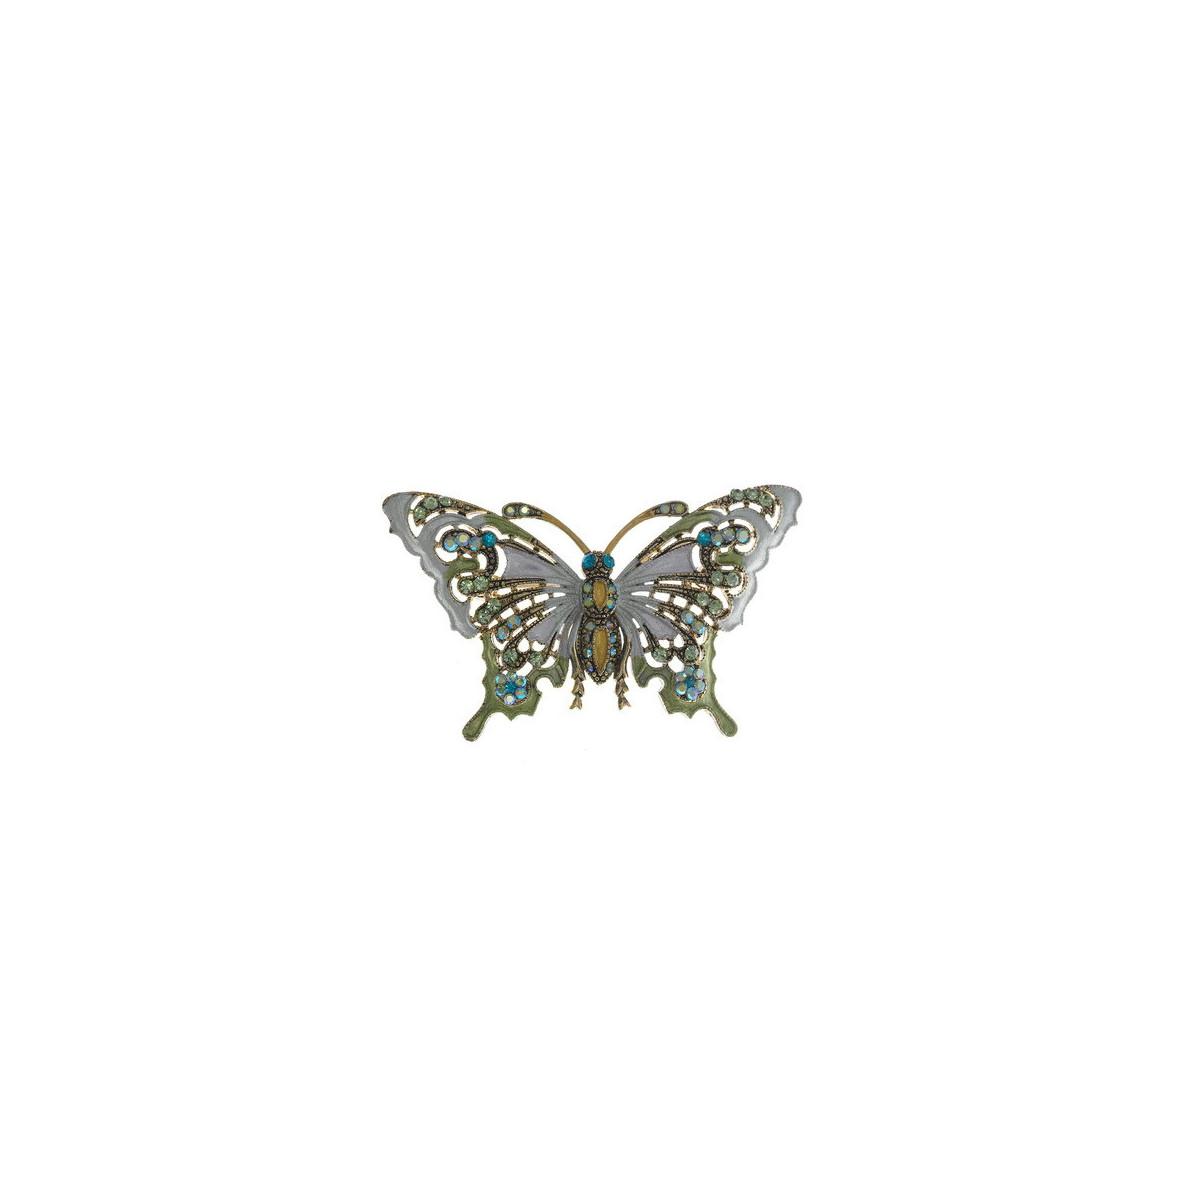 Broche Salvatore Metal Mariposa 226BM073